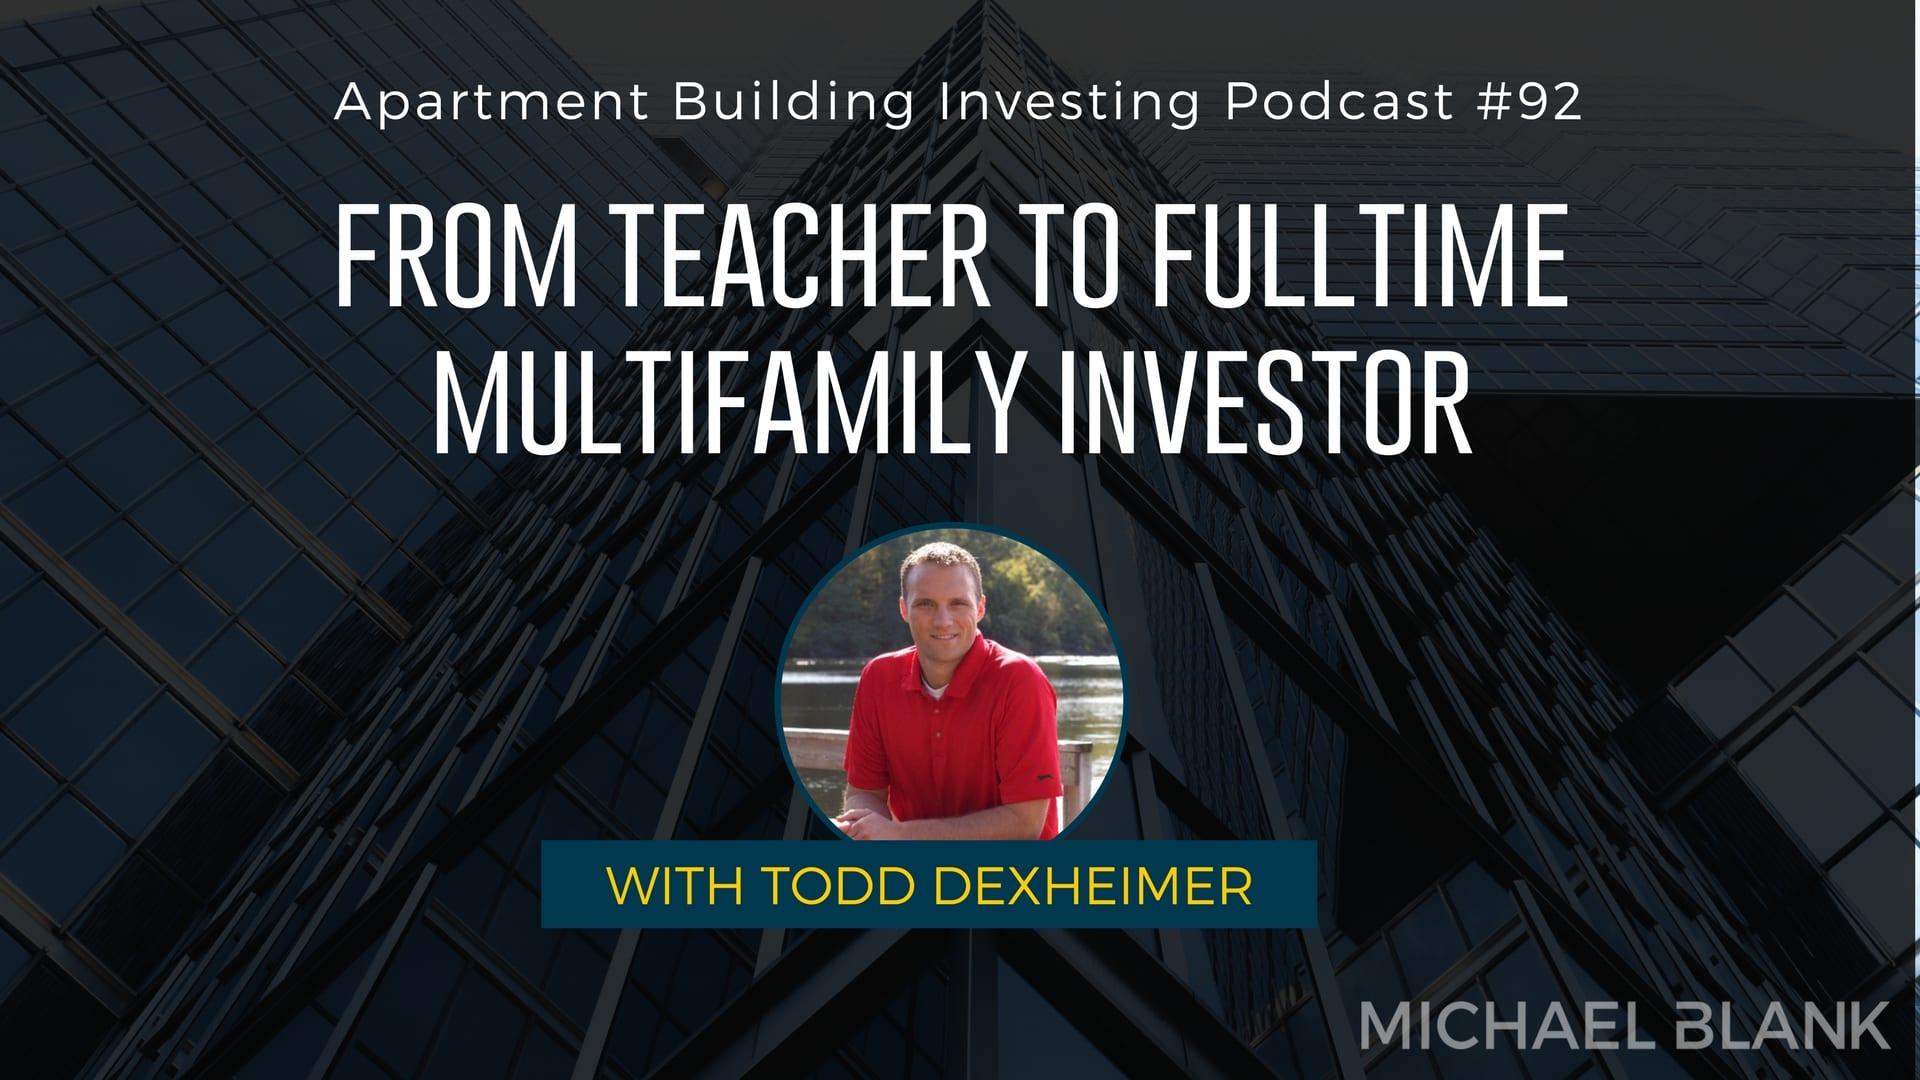 MB 092: From Teacher to Fulltime Multifamily Investor – with Todd Dexheimer